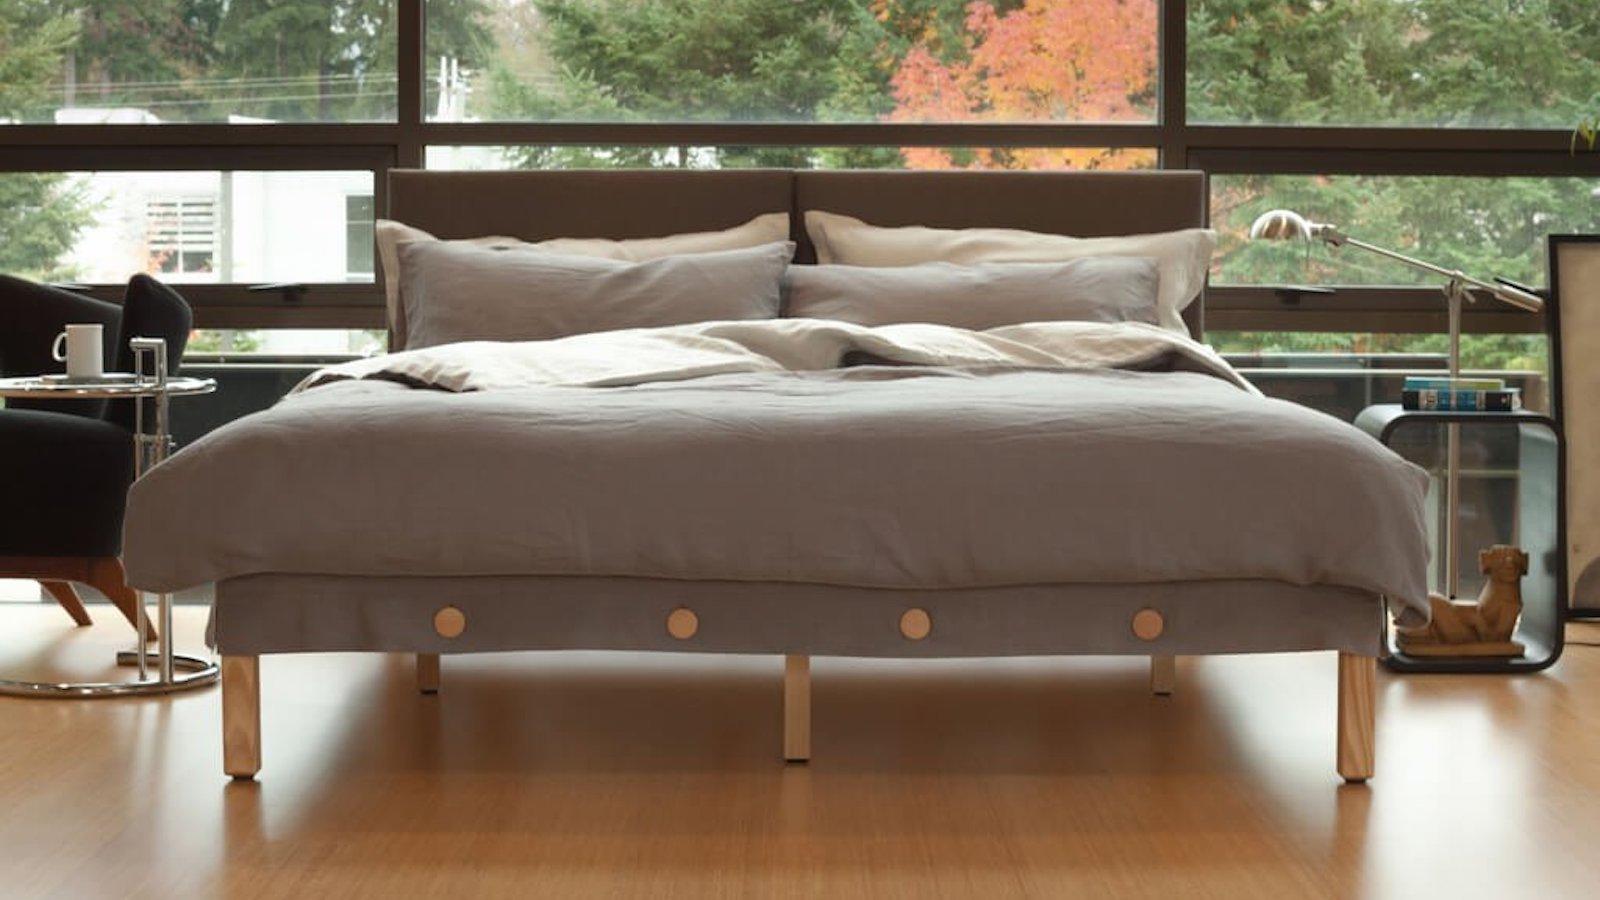 Horizontal Button Bed pain-relief mattress